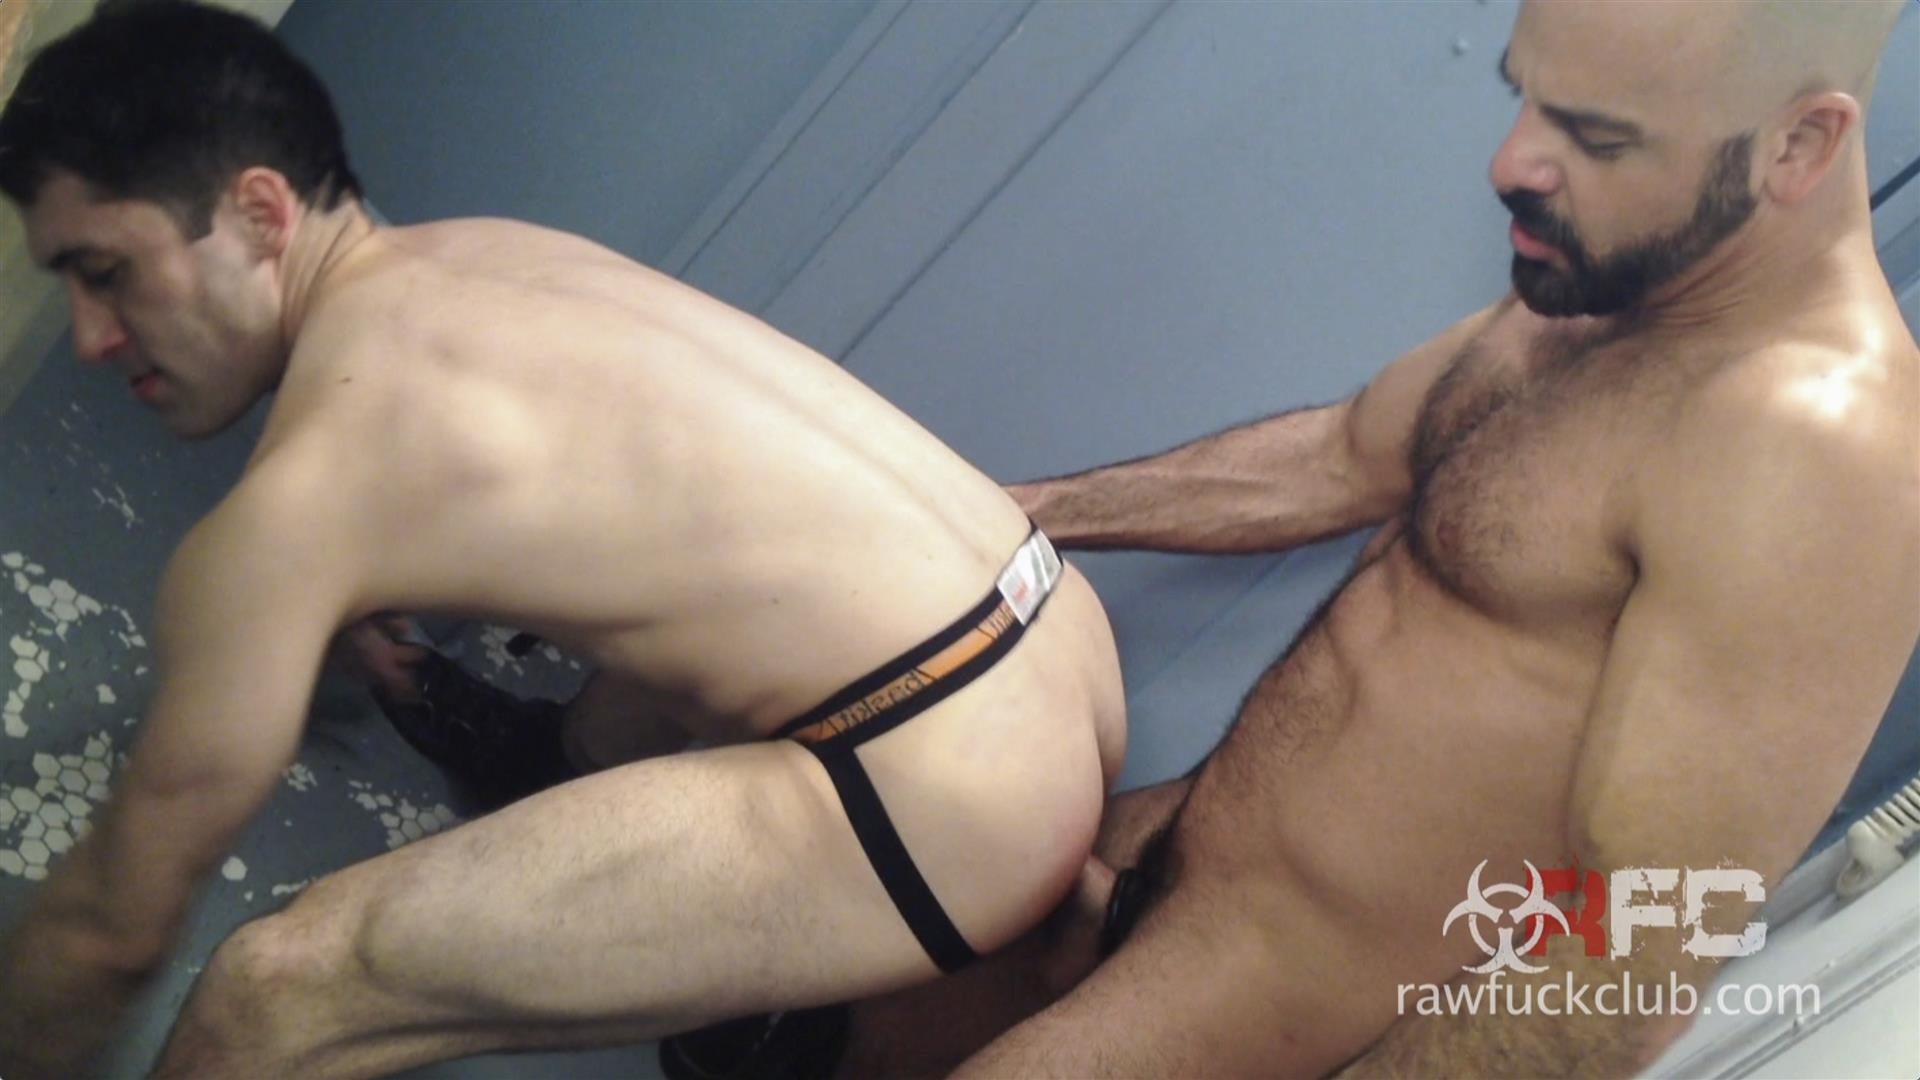 Raw Fuck Club Adam Russo and Kyle Ferris Anonymous Bareback Sex Amateur Gay Porn 6 Adam Russo Barebacking A Stranger In A Dirty Bar Bathroom